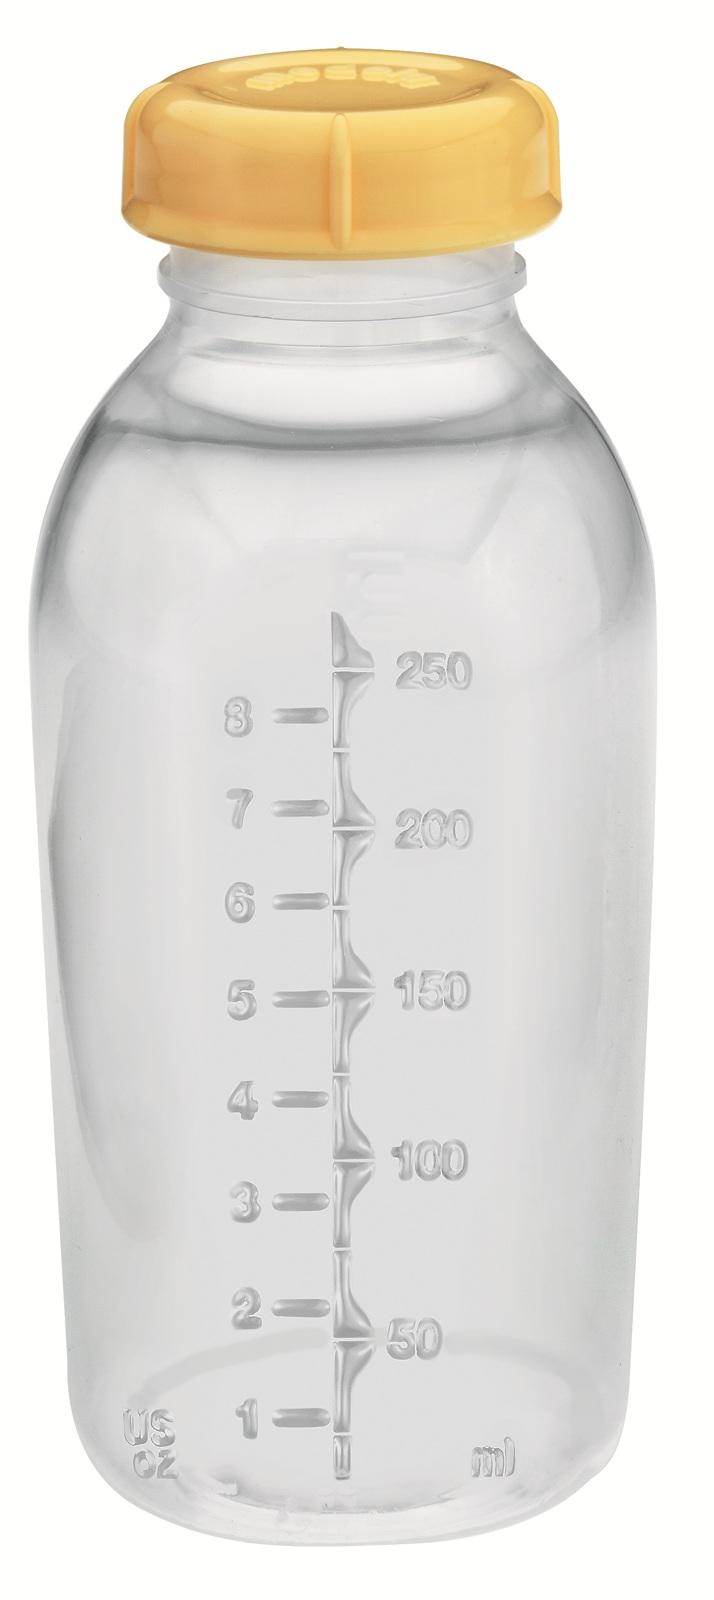 medela-bottle-one-part-lid-8oz.jpg